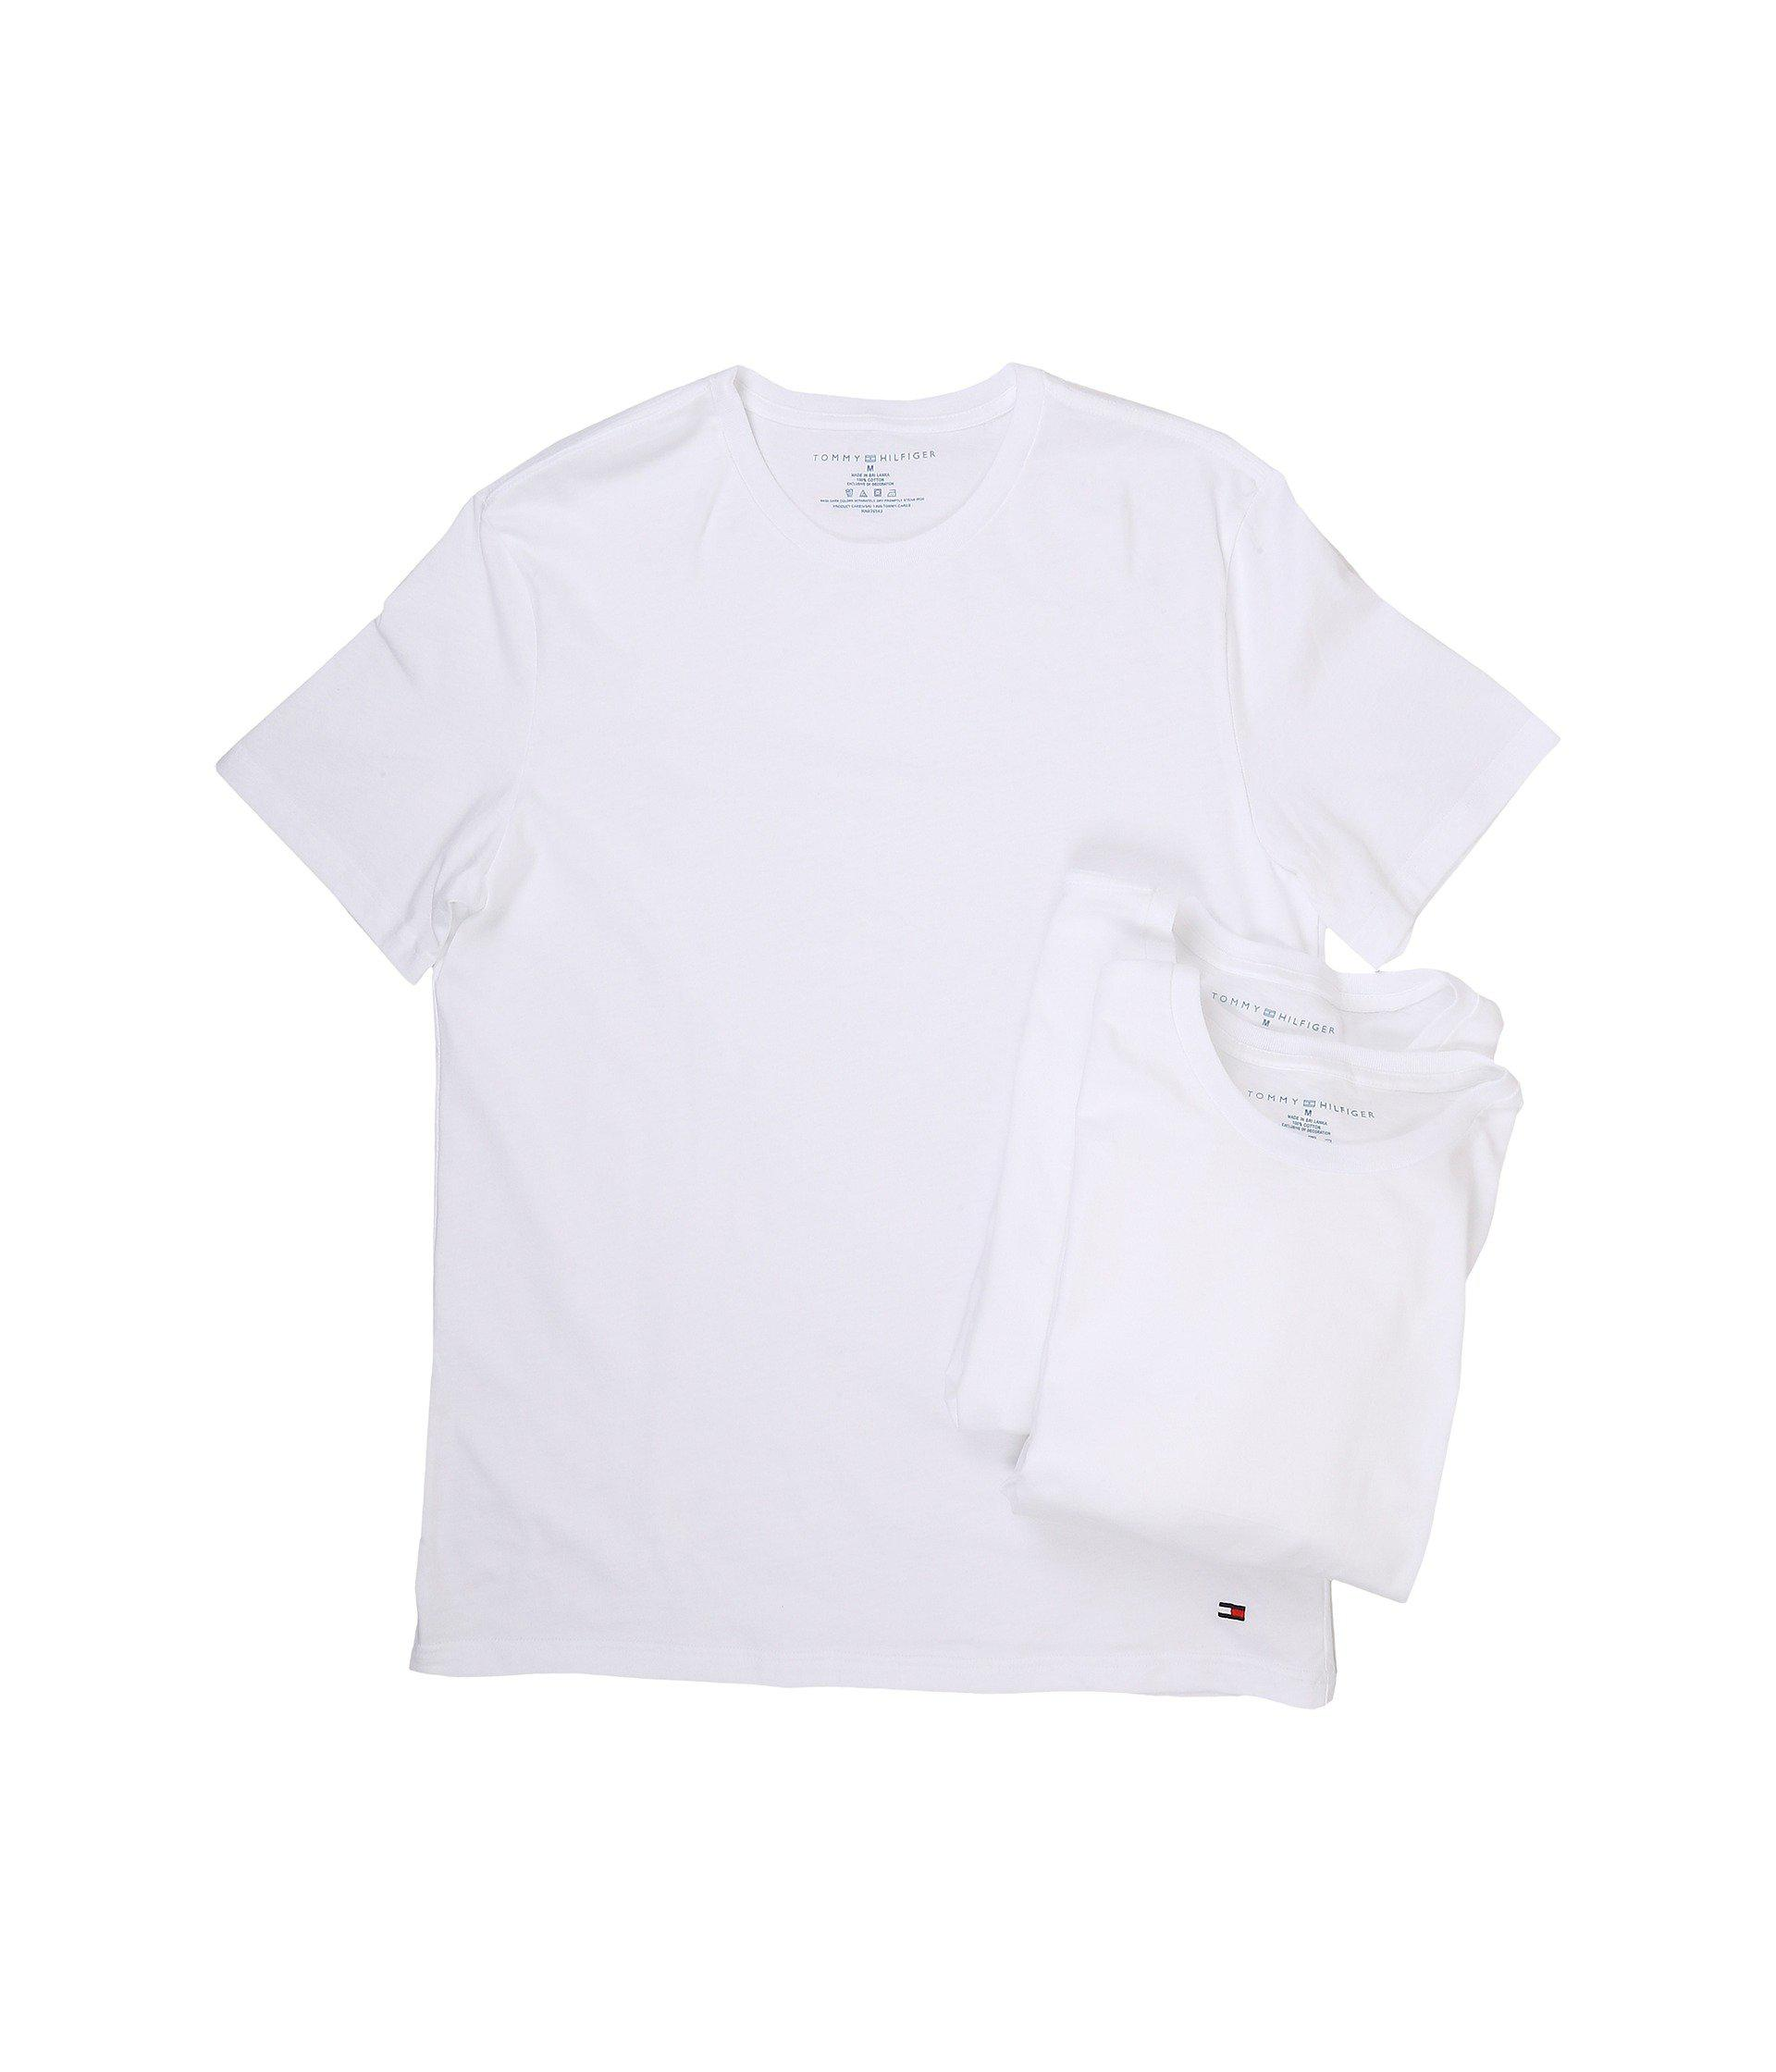 8d7020023 Lyst - Tommy Hilfiger Cotton Crew Neck Shirt 3-pack (white) Men's ...